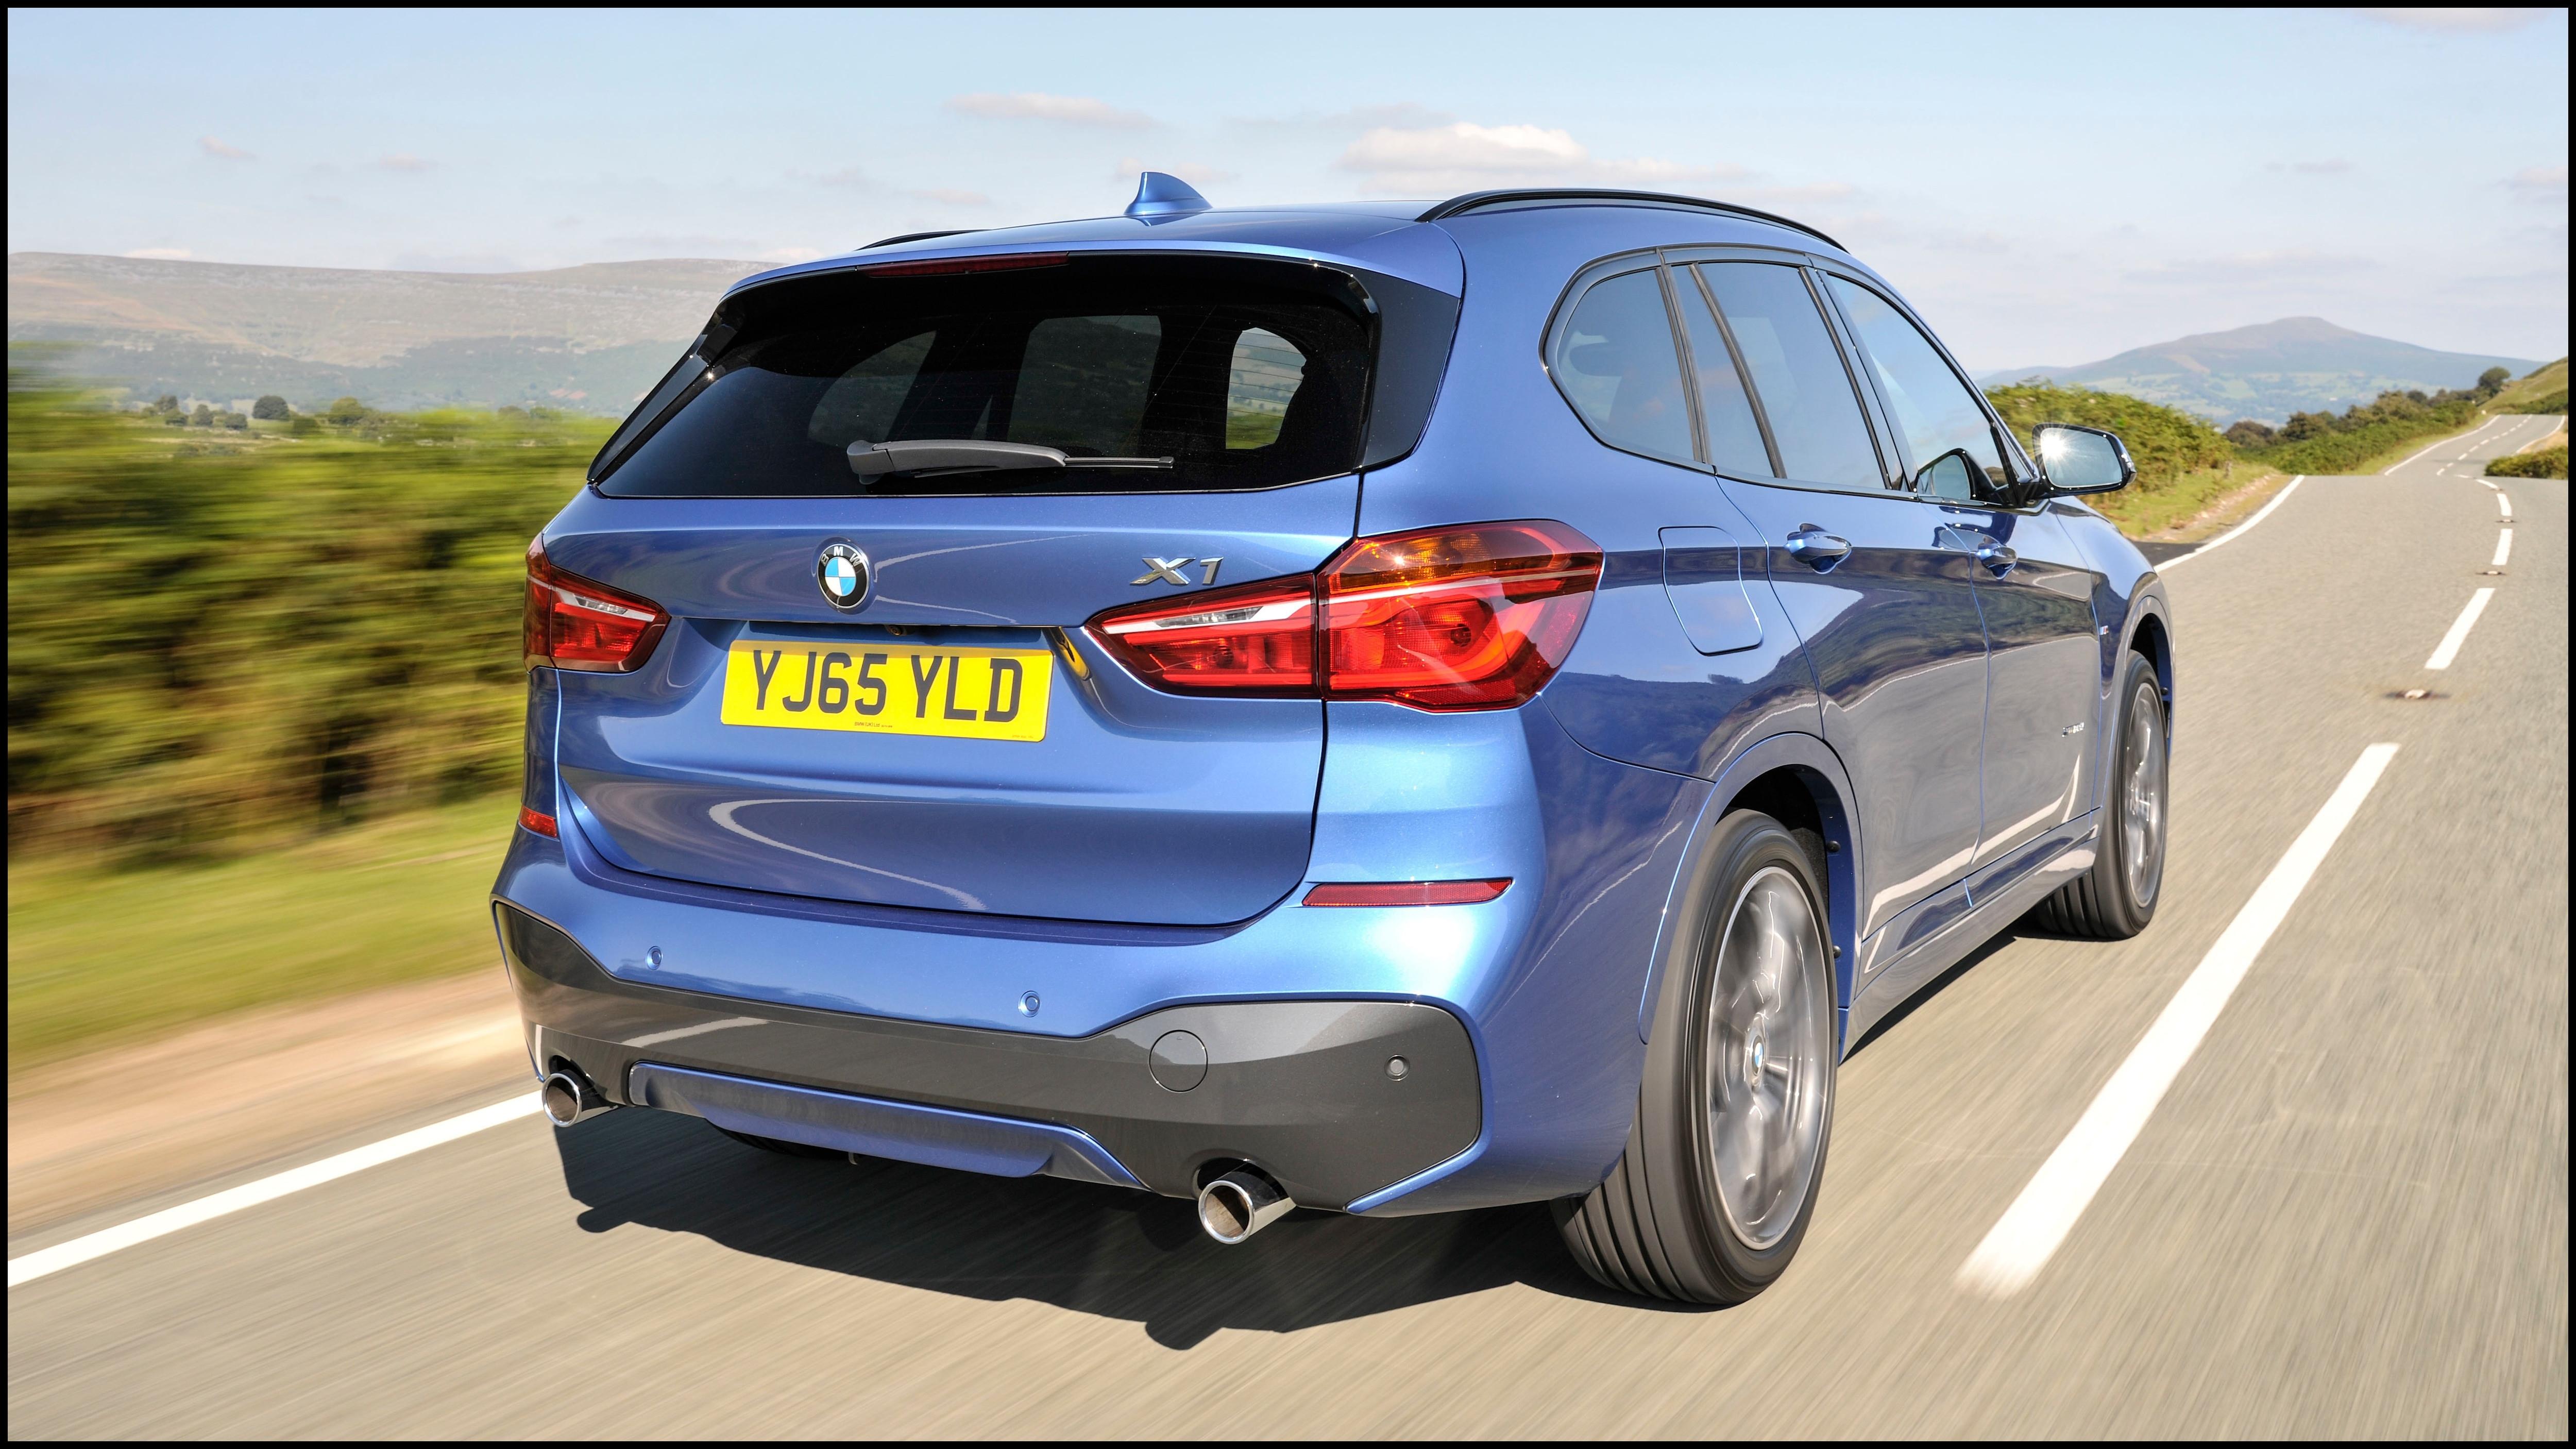 Length 2019 Bmw X3 Inspirational X3 Dimensions 2019 Car Desktop Lovely Bmw X3 3 0d